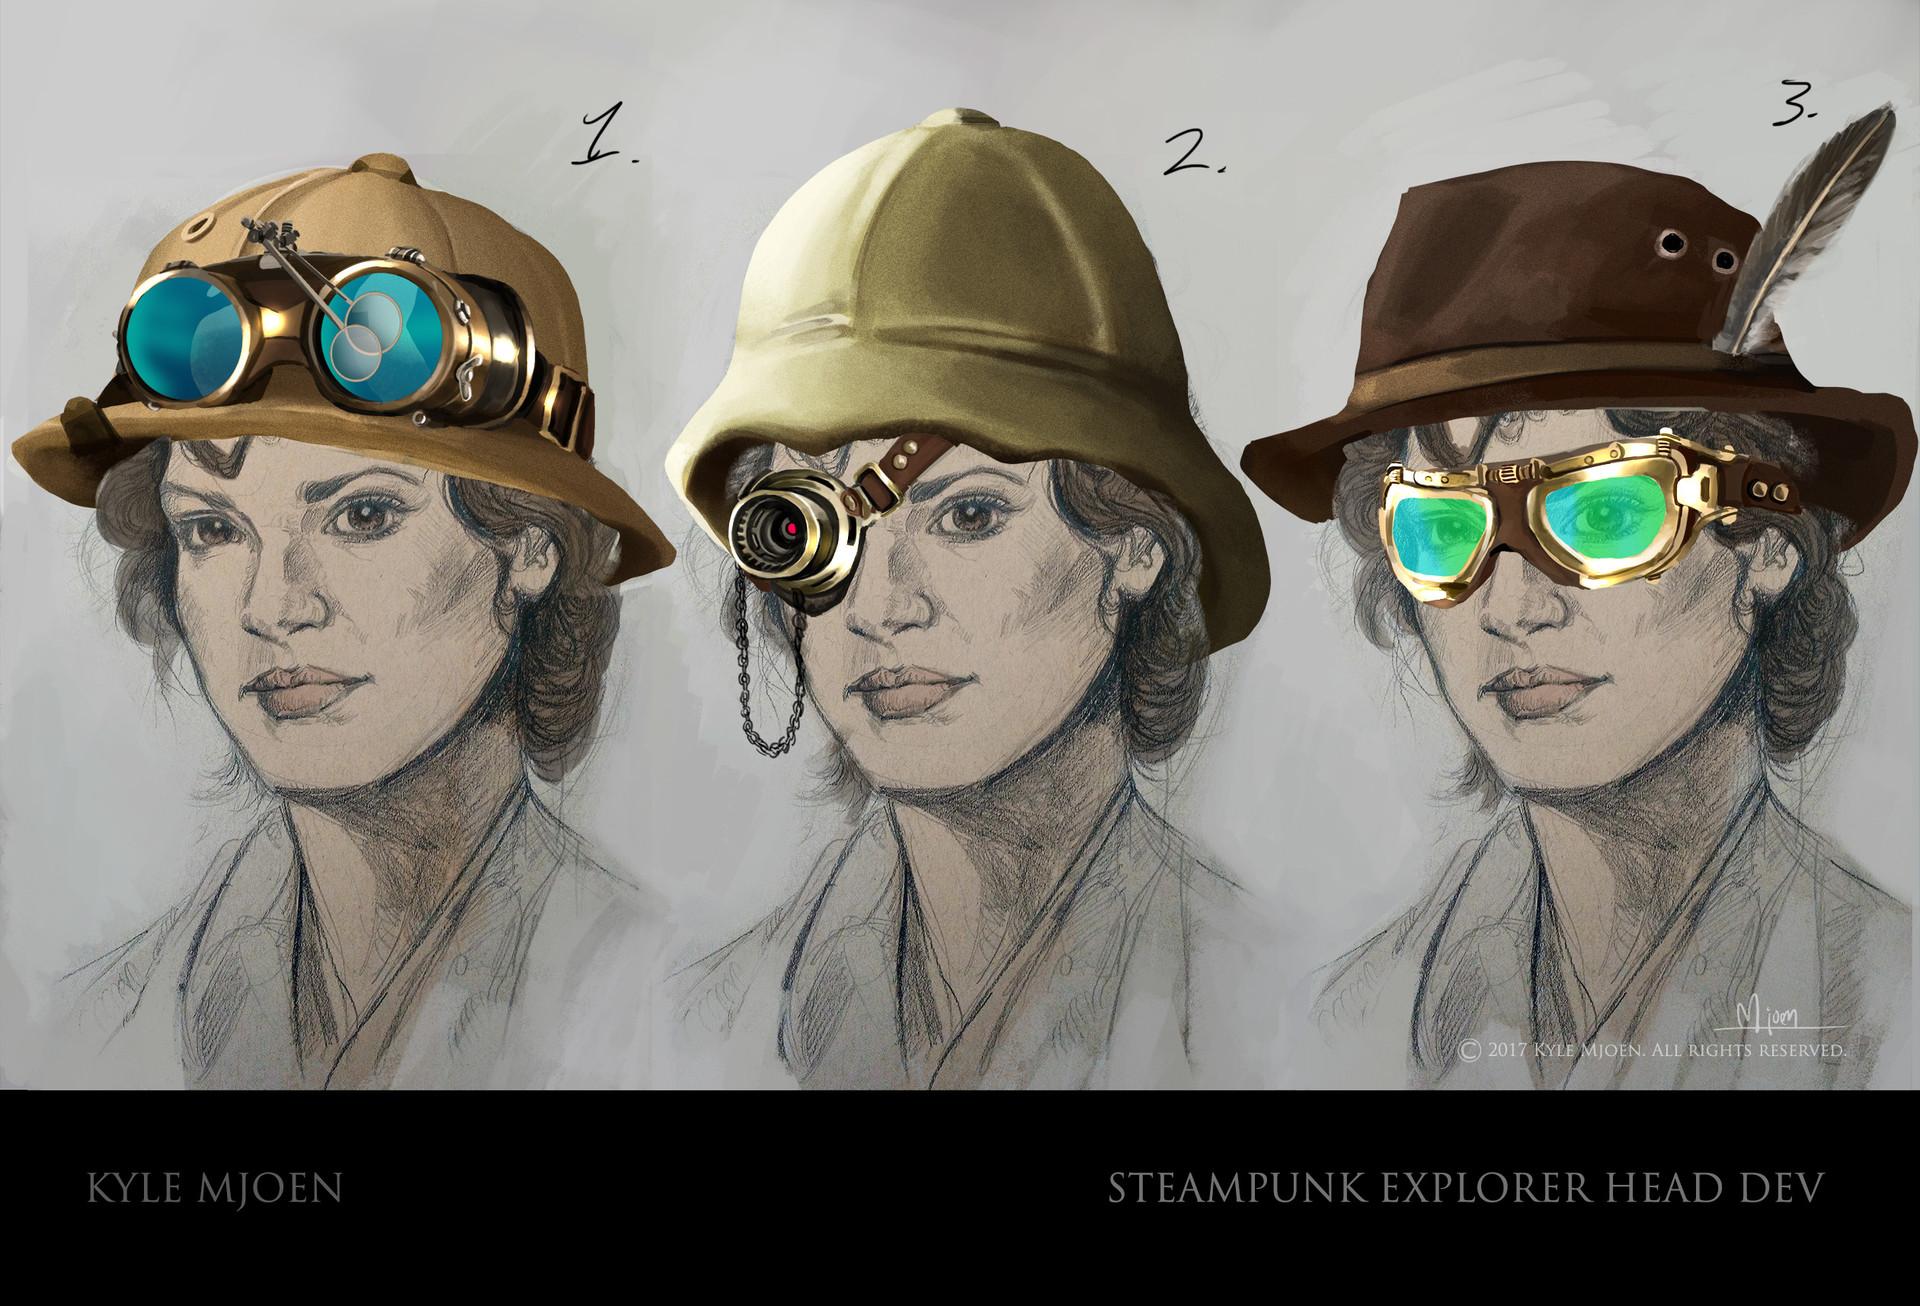 Kyle mjoen steampunk hex dev